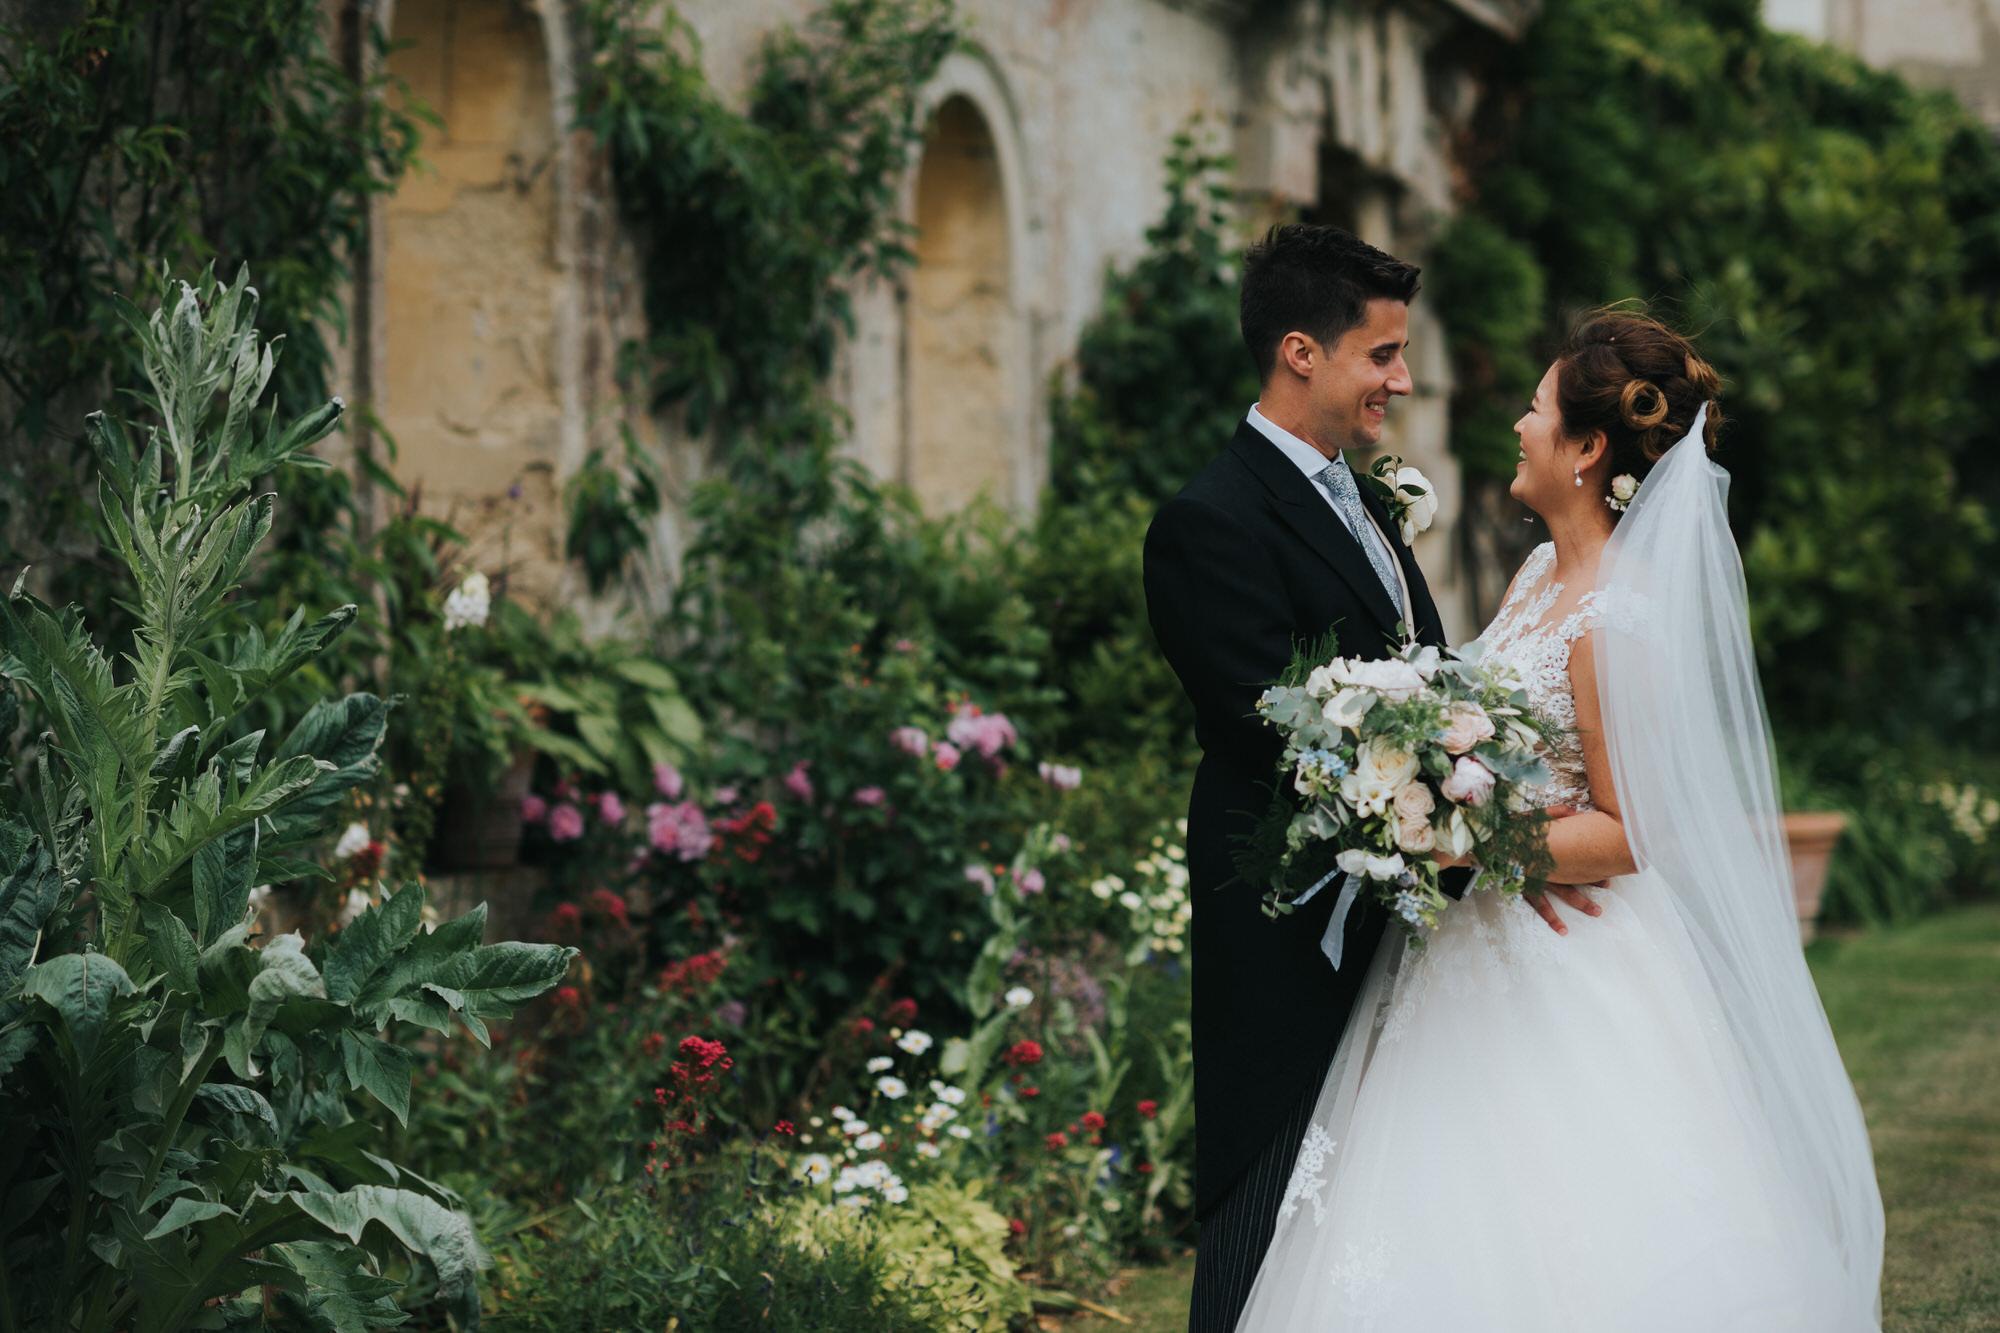 Kirtlington park wedding couple